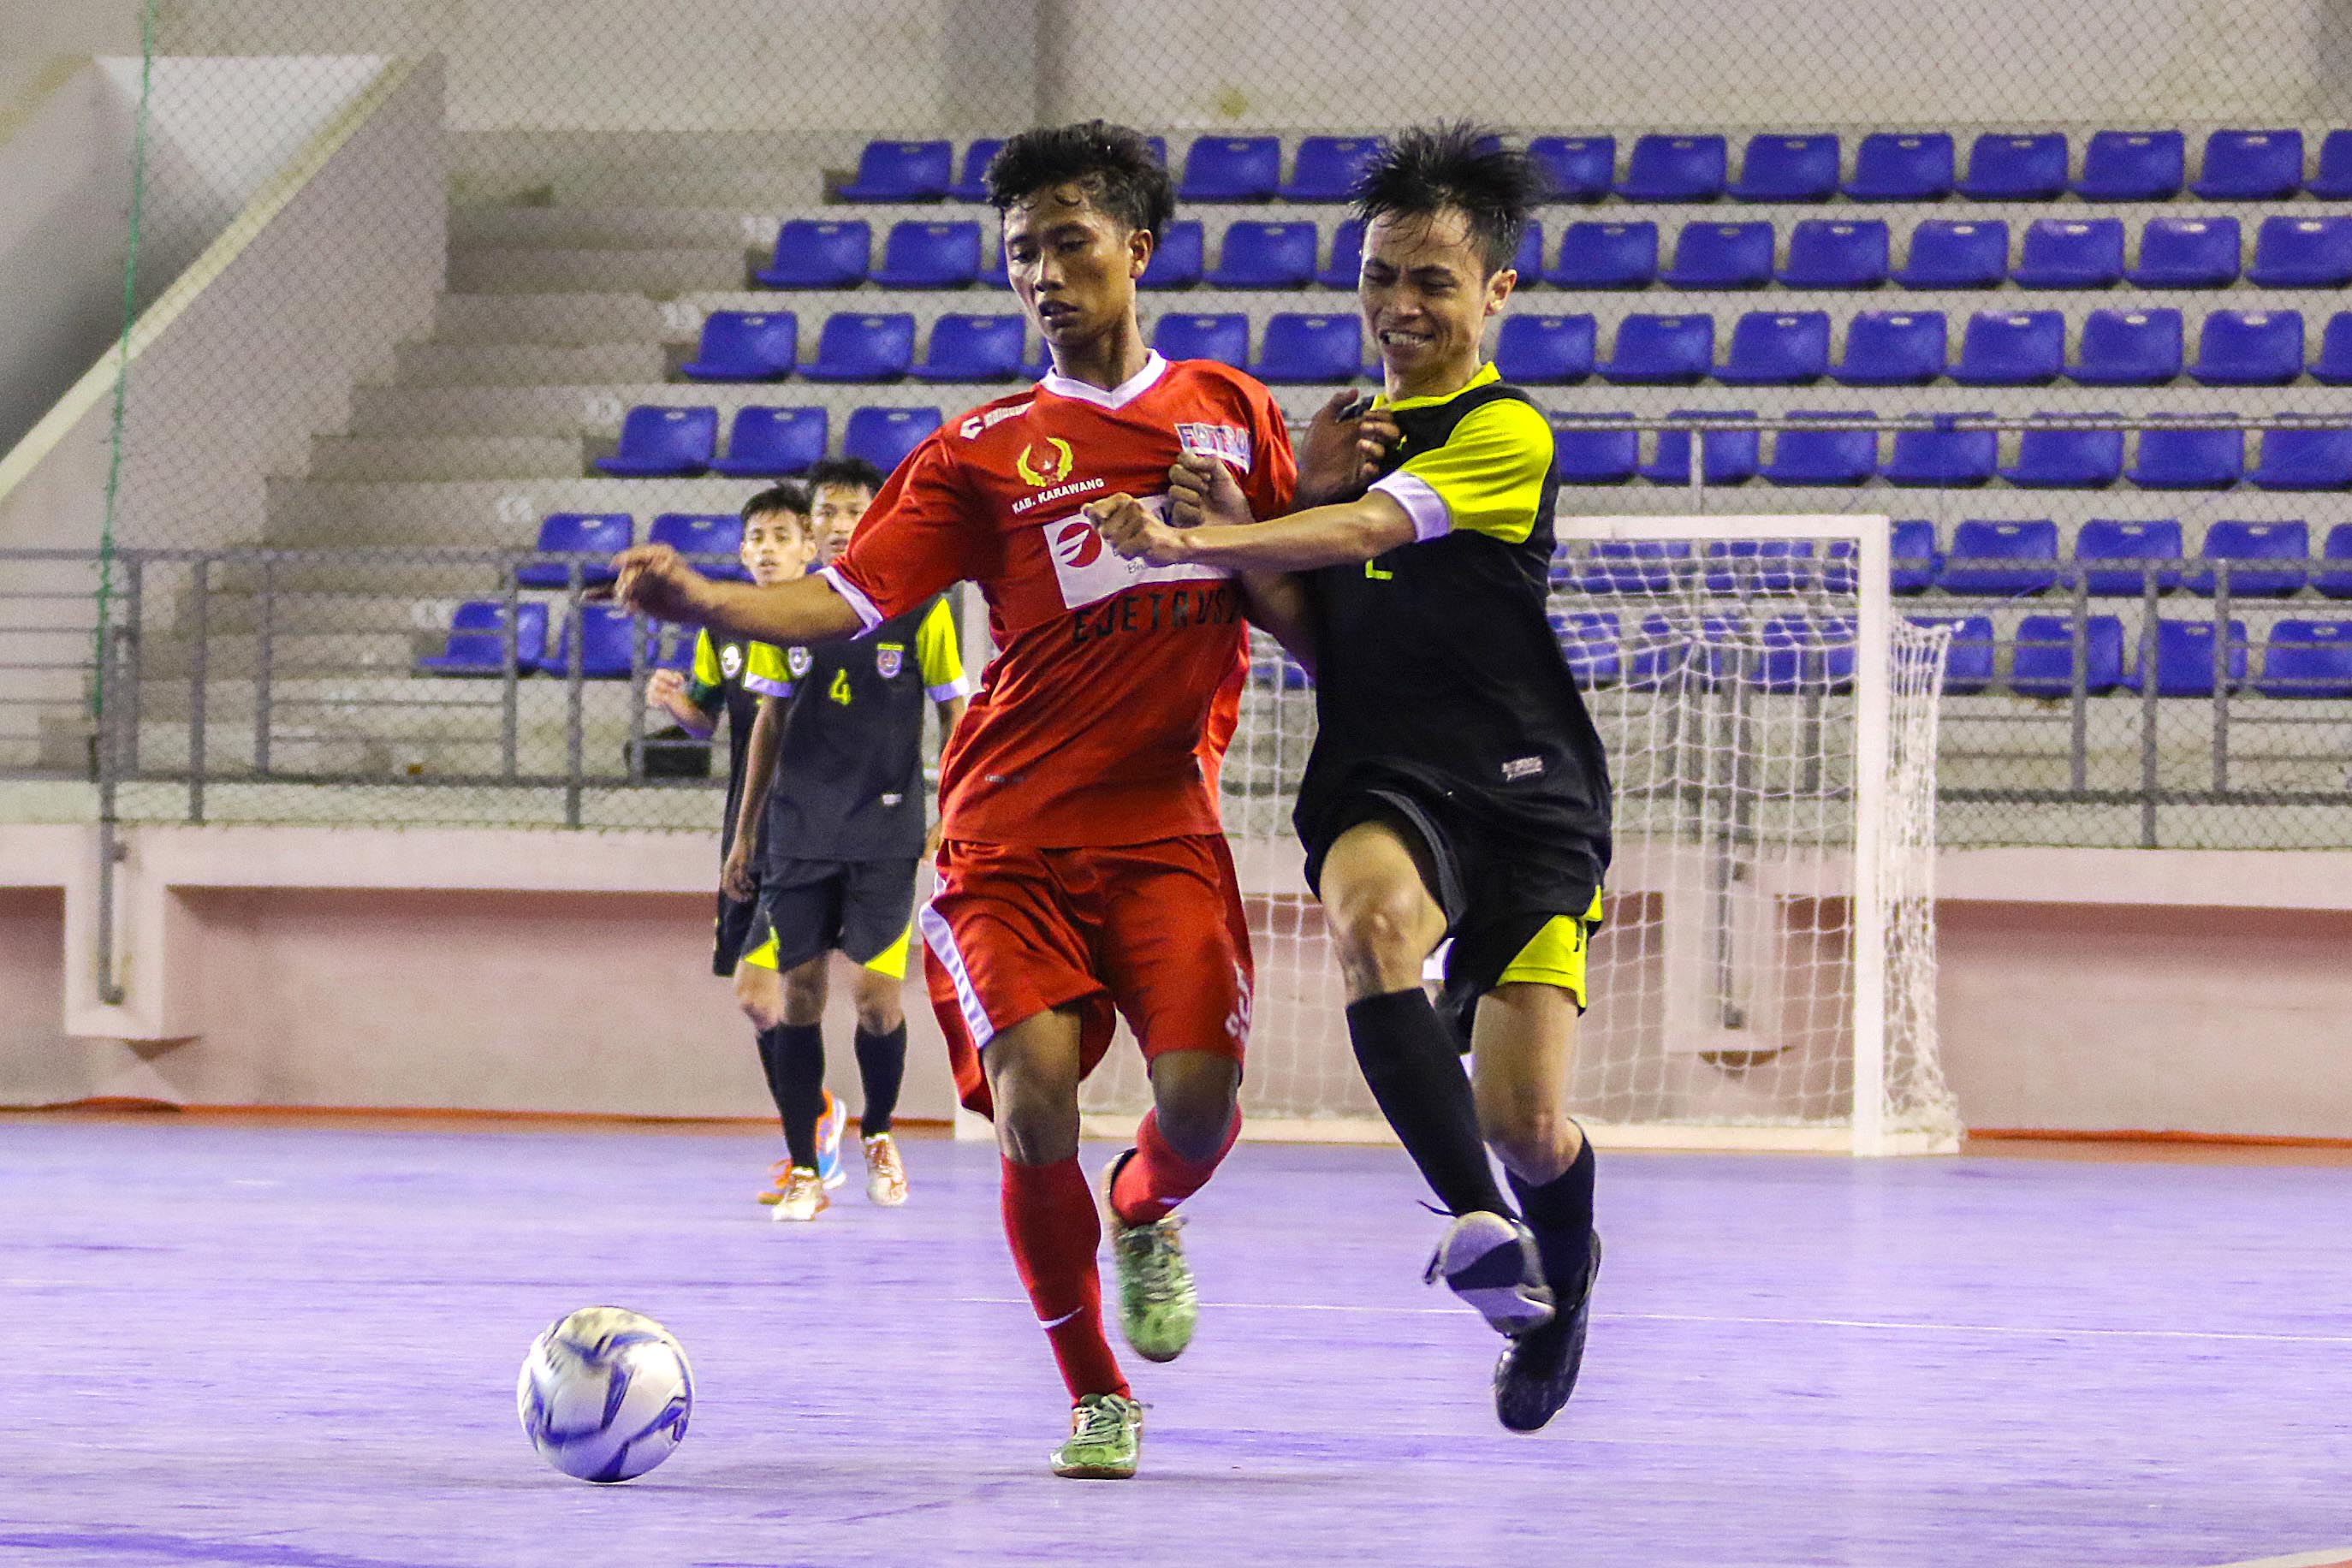 Pemain Depok (hitam-kuning) sedang berduel merebut bola dengan pemain Kab. Karawang (merah) pada laga kemarin (14/10).